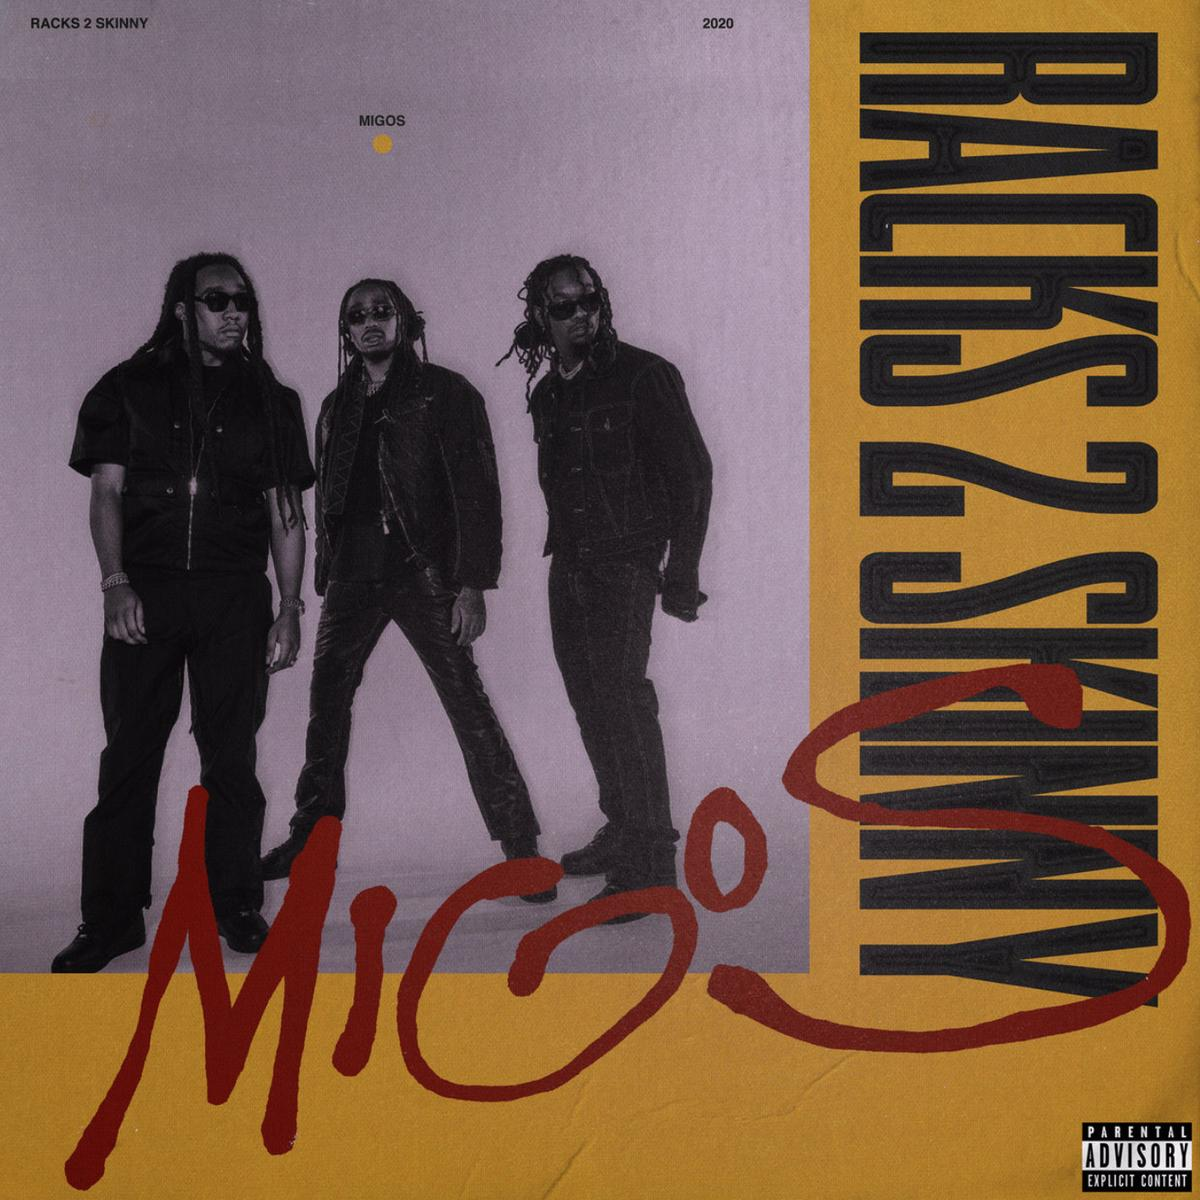 Migos Racks 2 Skinny Audio Lyrics Video Download Mp3 Music Lyrics Music Video